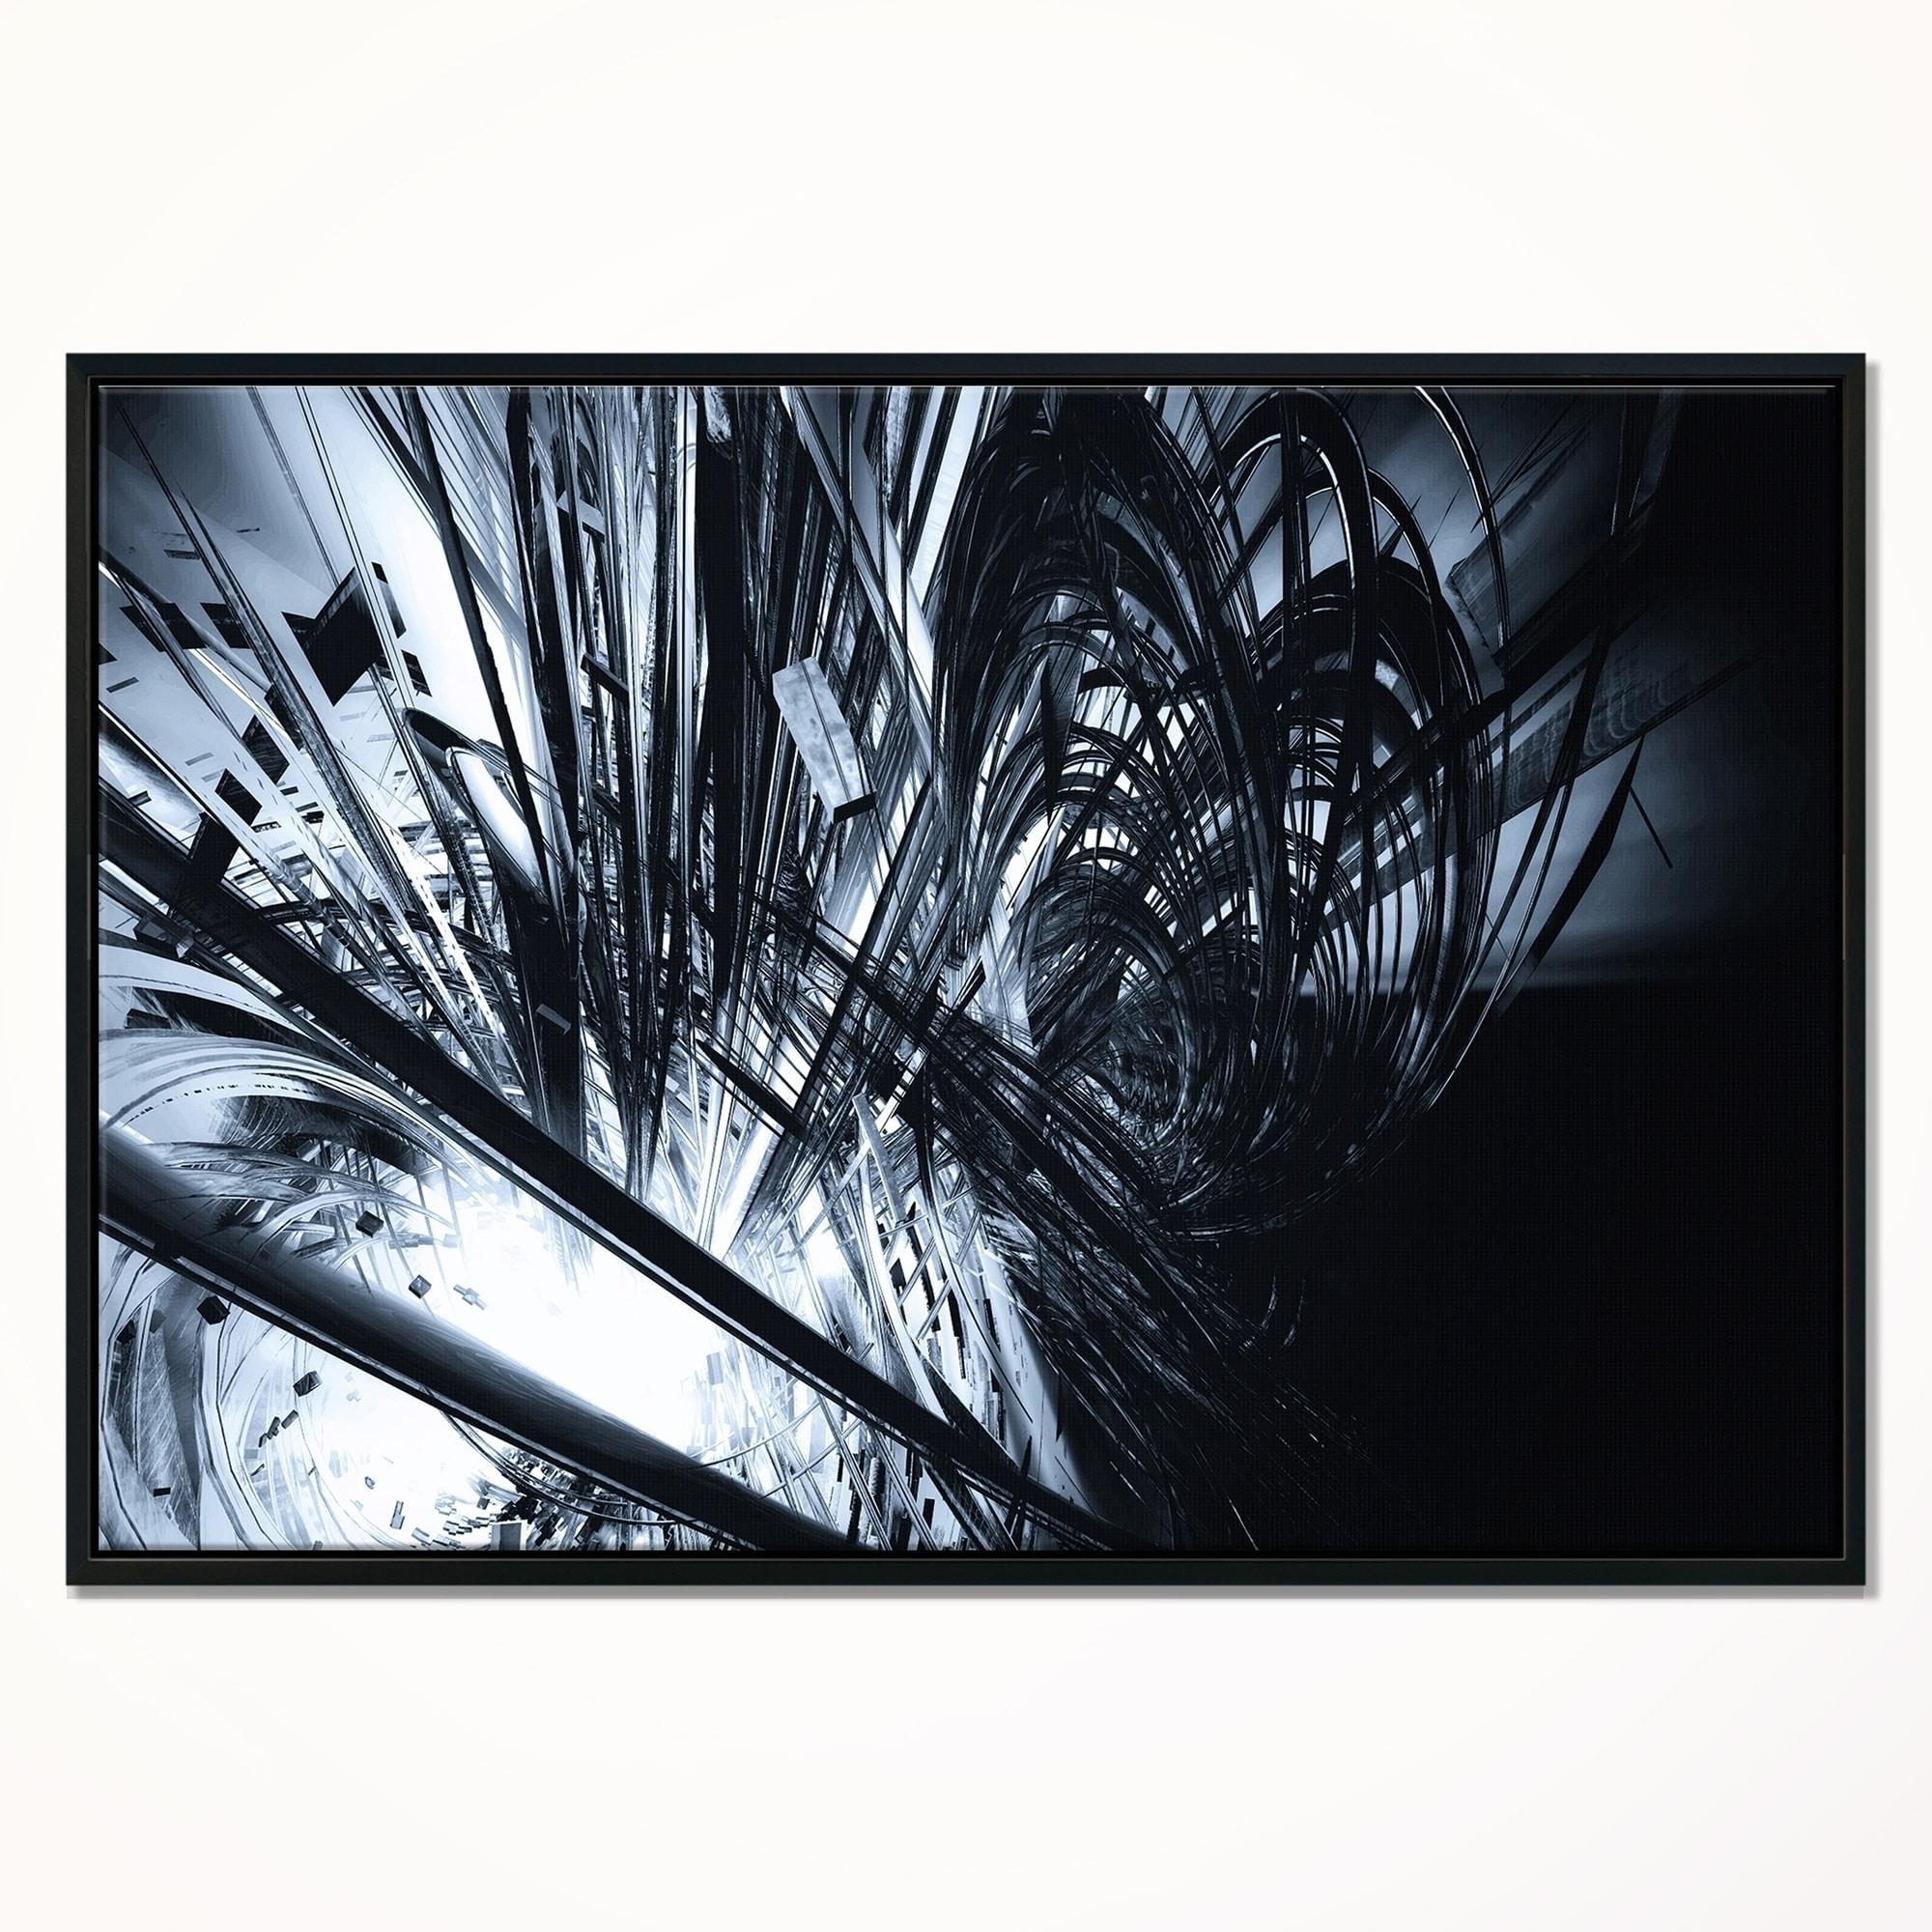 8a0cd644b2 Designart  3D Abstract Art Black White  Abstract Framed Canvas art print